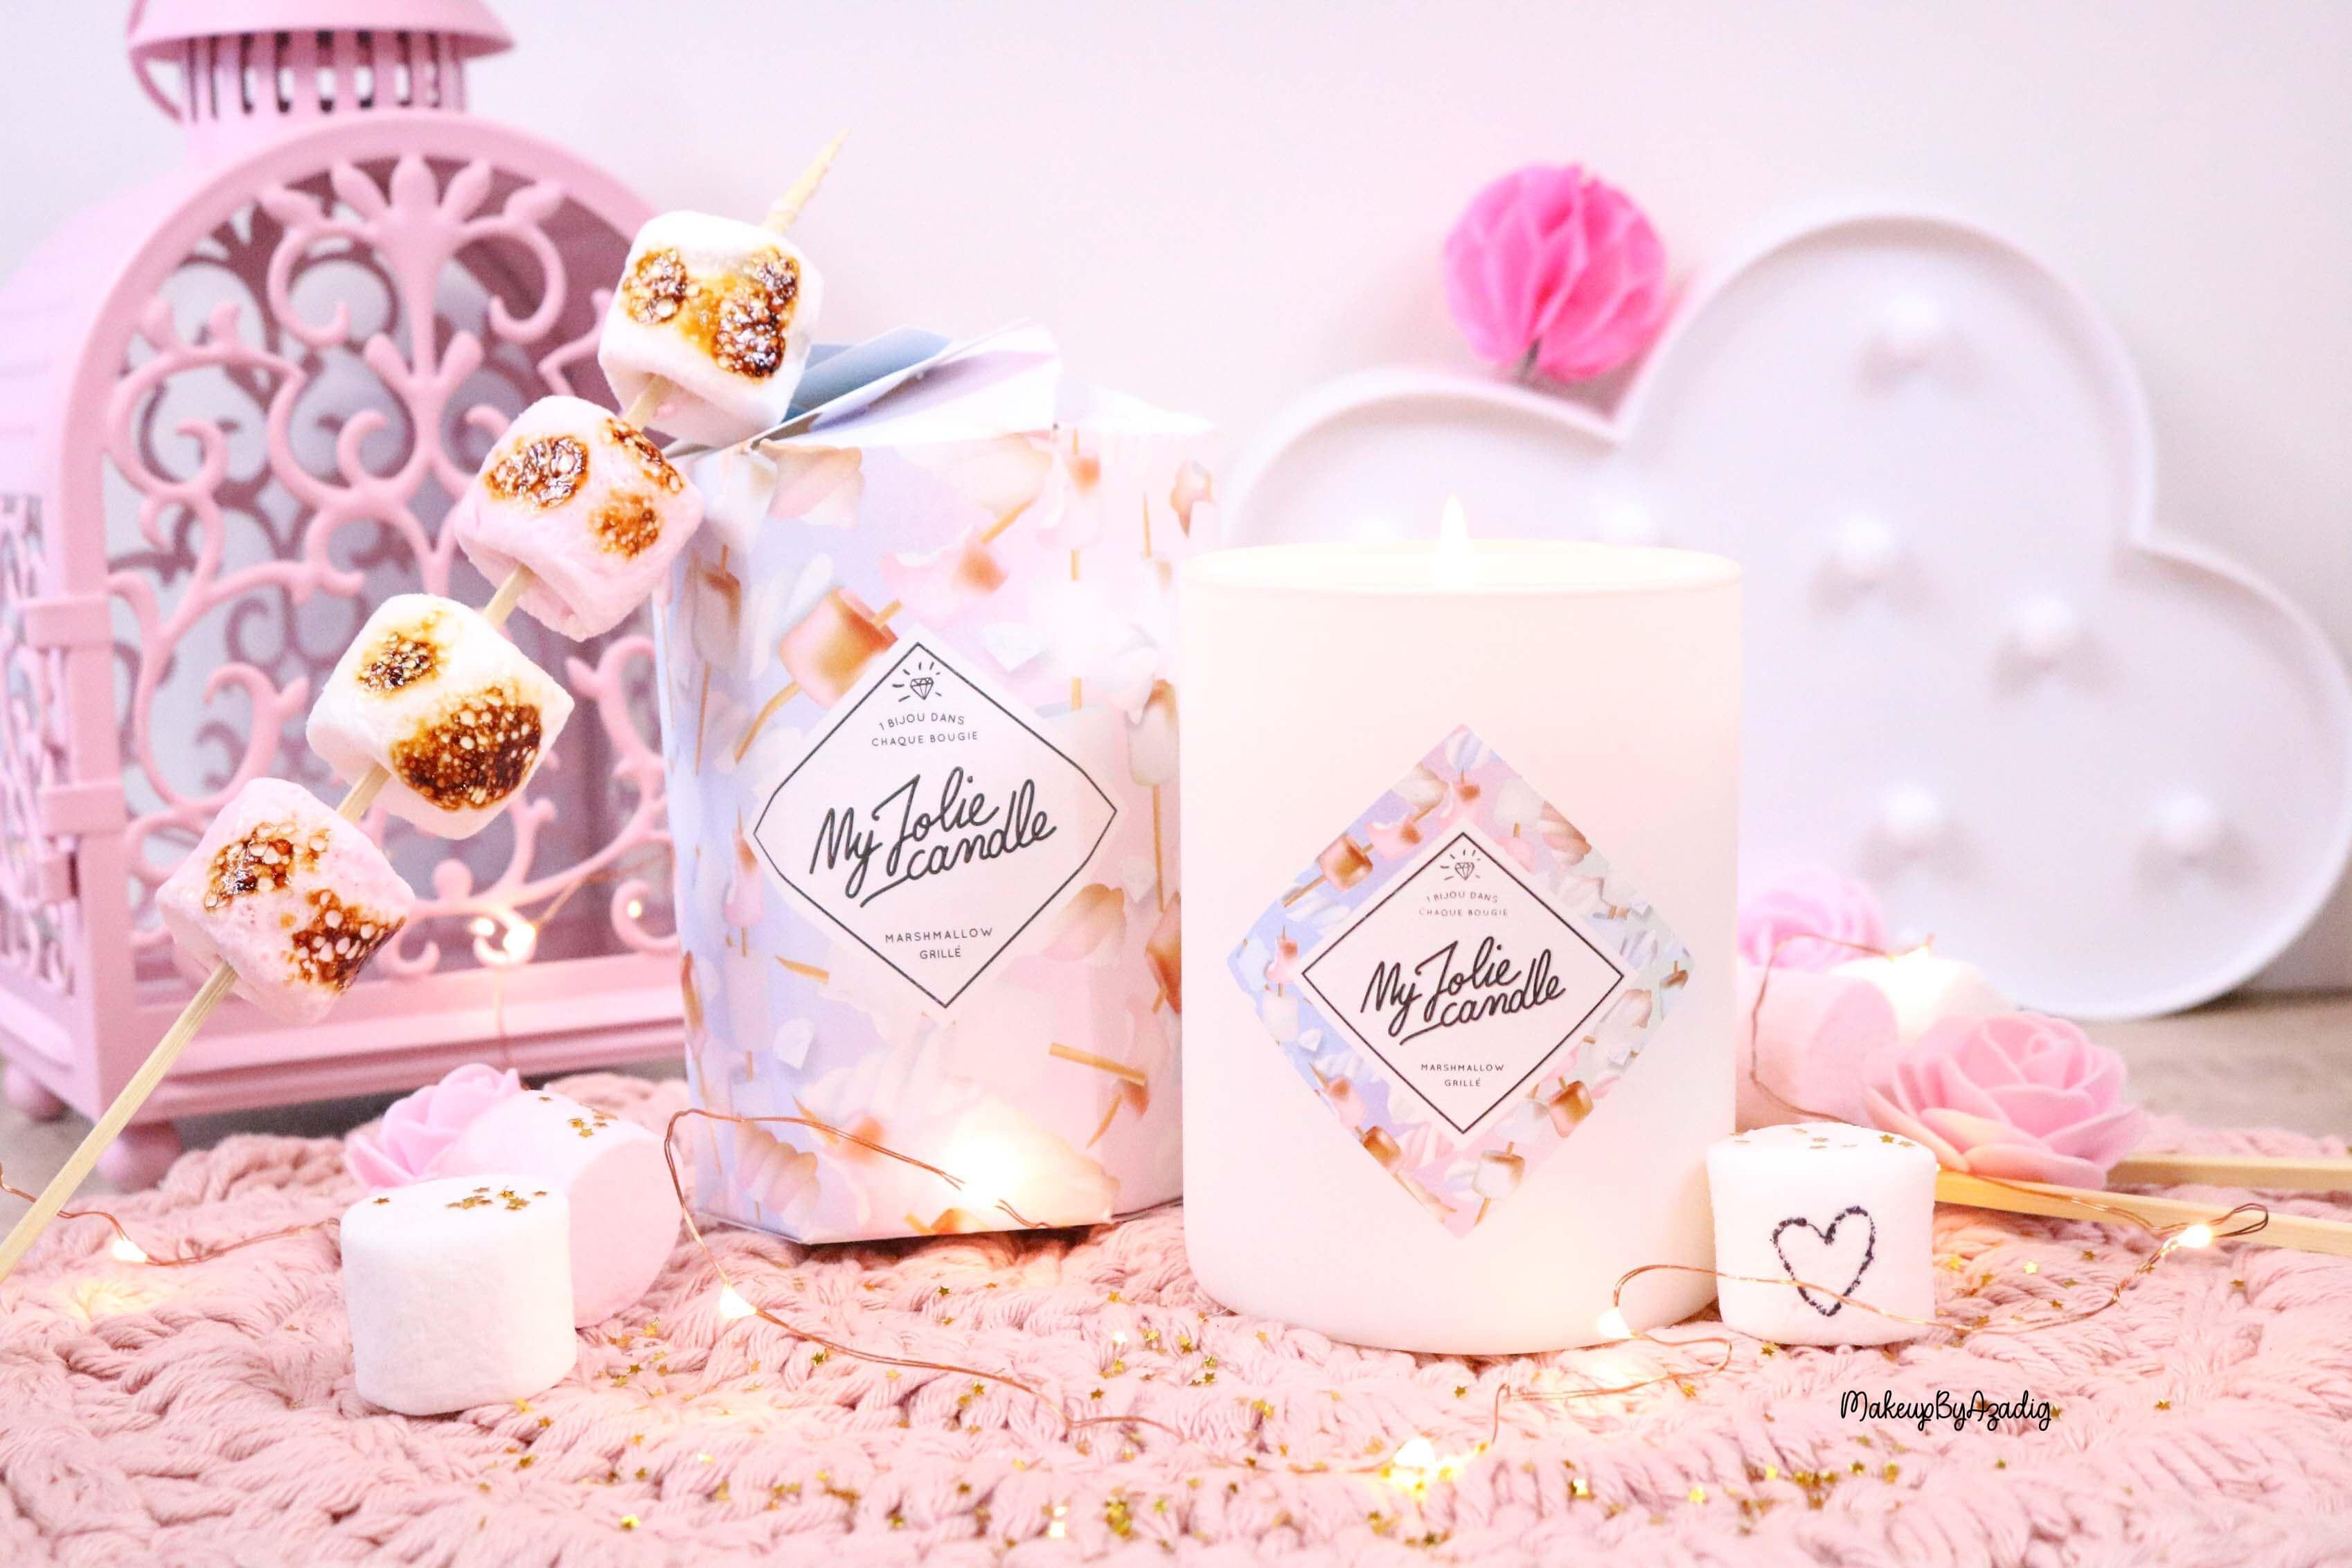 my-jolie-candle-bougie-bijou-swarovski-argent-cadeau-maman-mamie-femme-makeupbyazadig-collector-chamallow-avis-prix-decoration